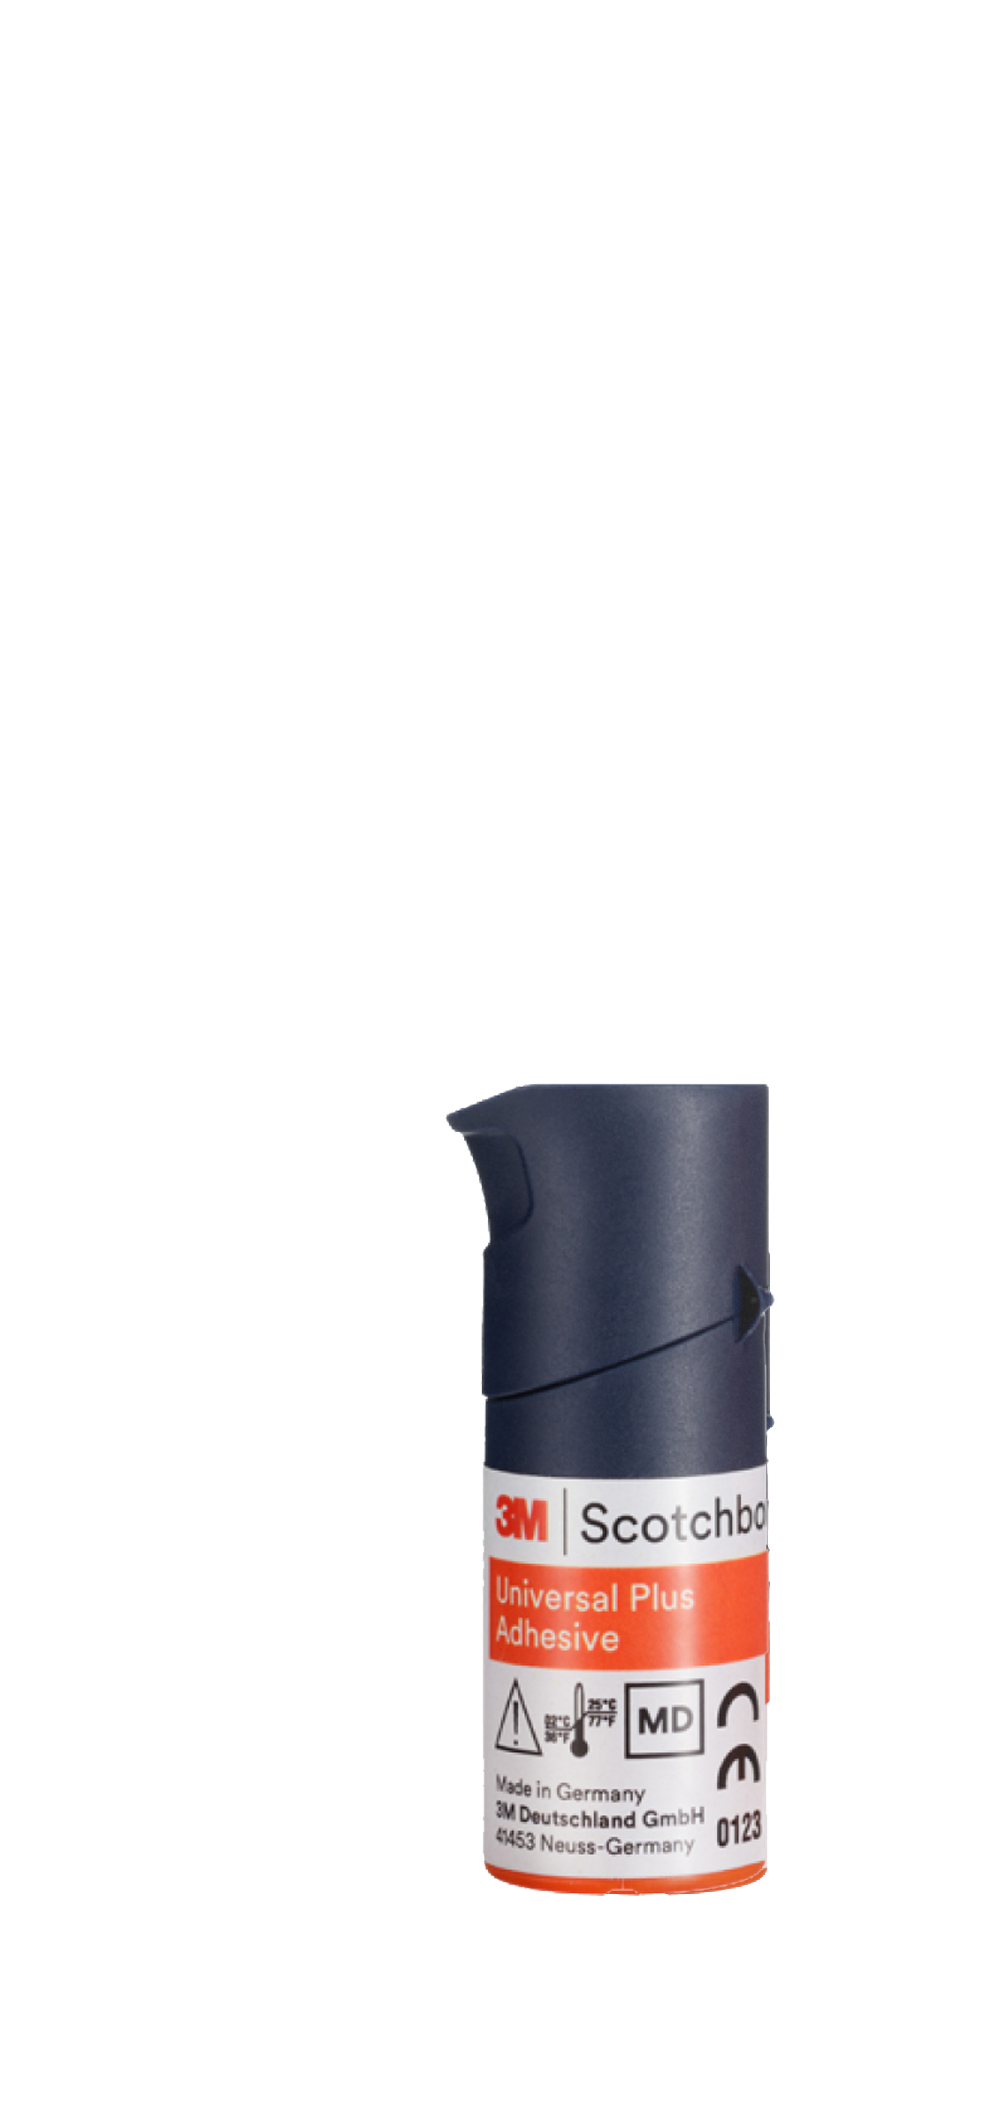 New 3M Scotchbond Universal Adhesive Plus styleitaliano